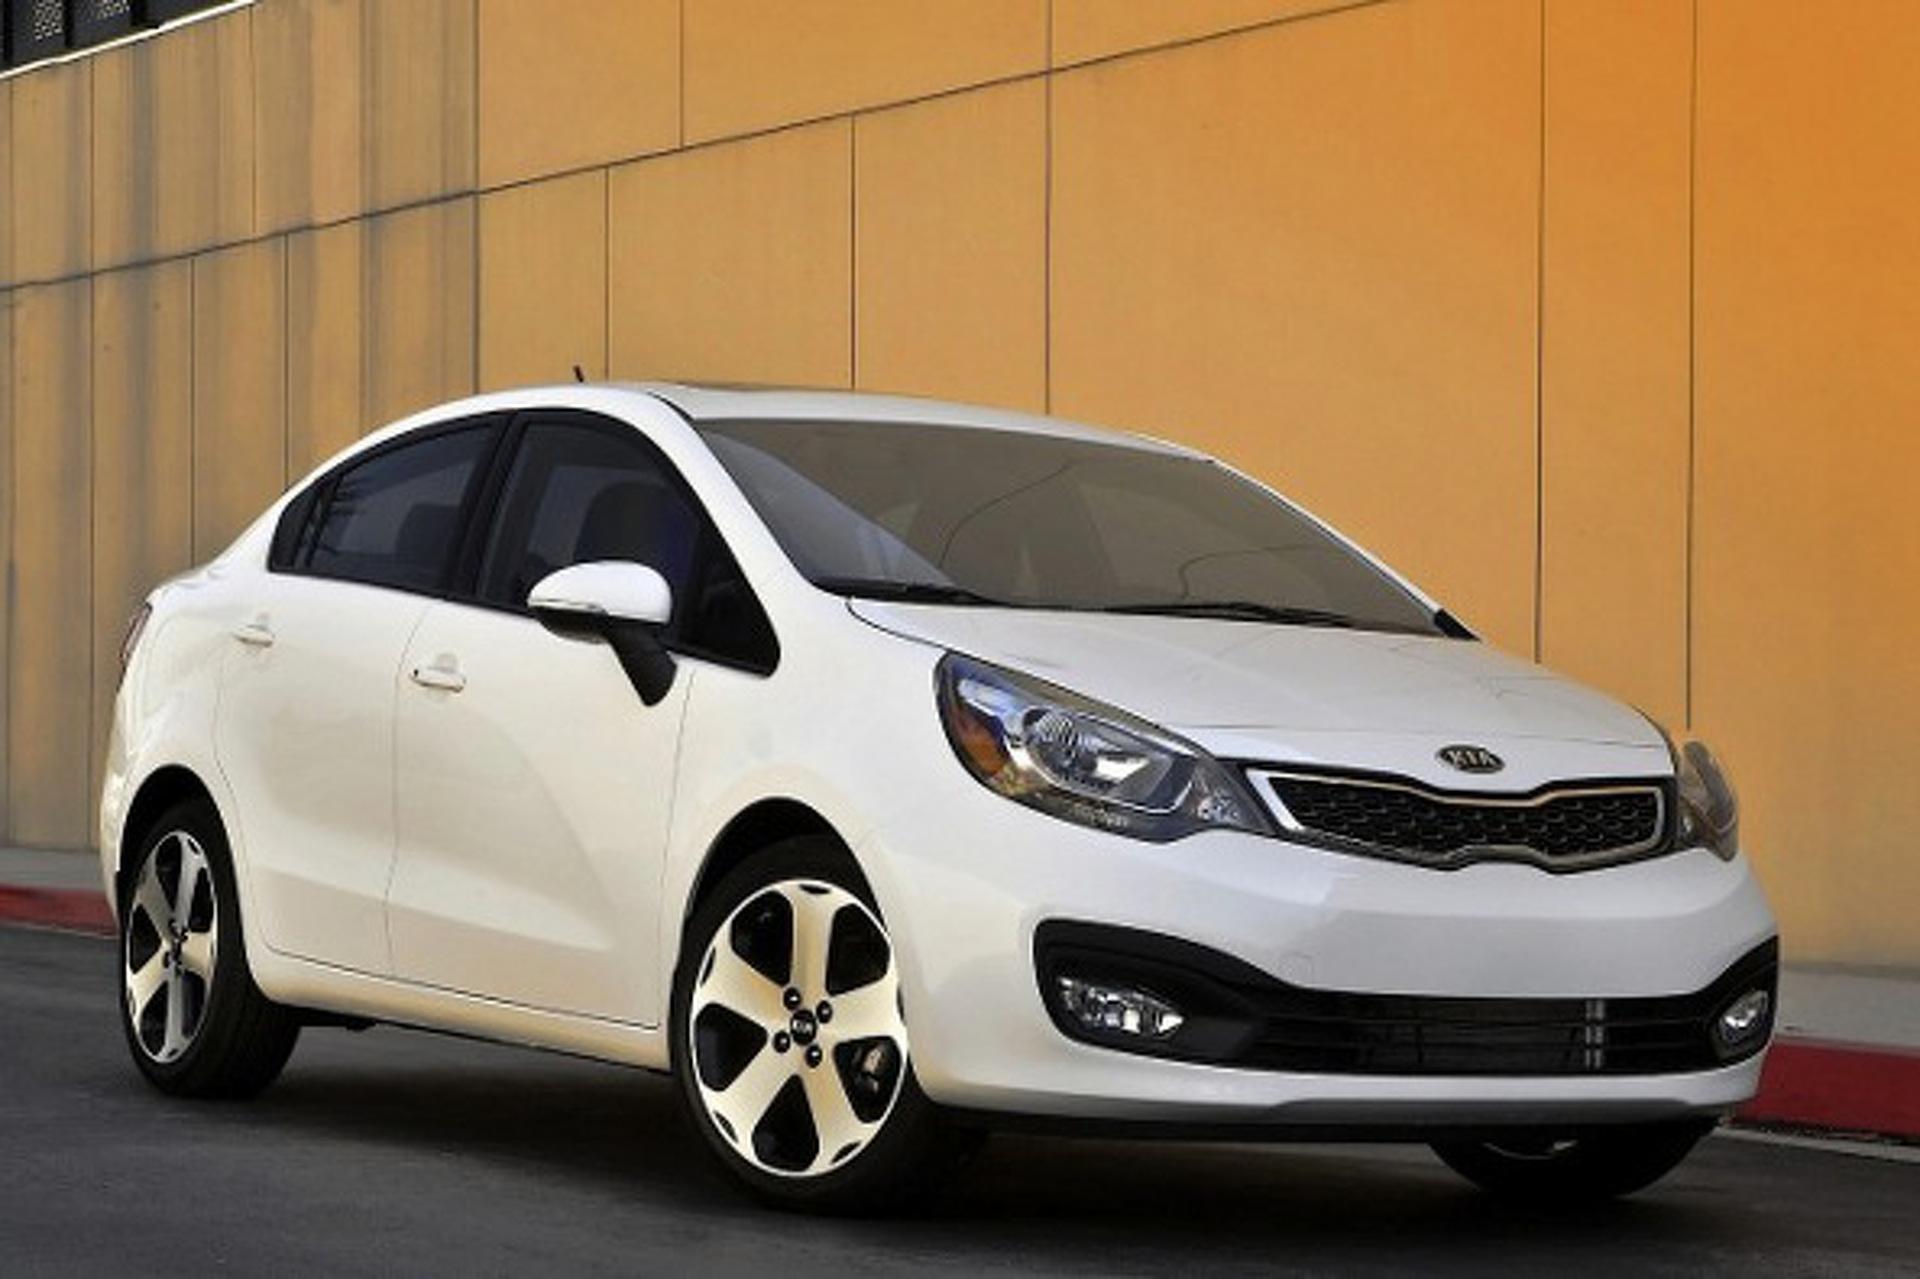 Kia and Hyundai Retracts Fuel Economy Estimates...What You Need to Know